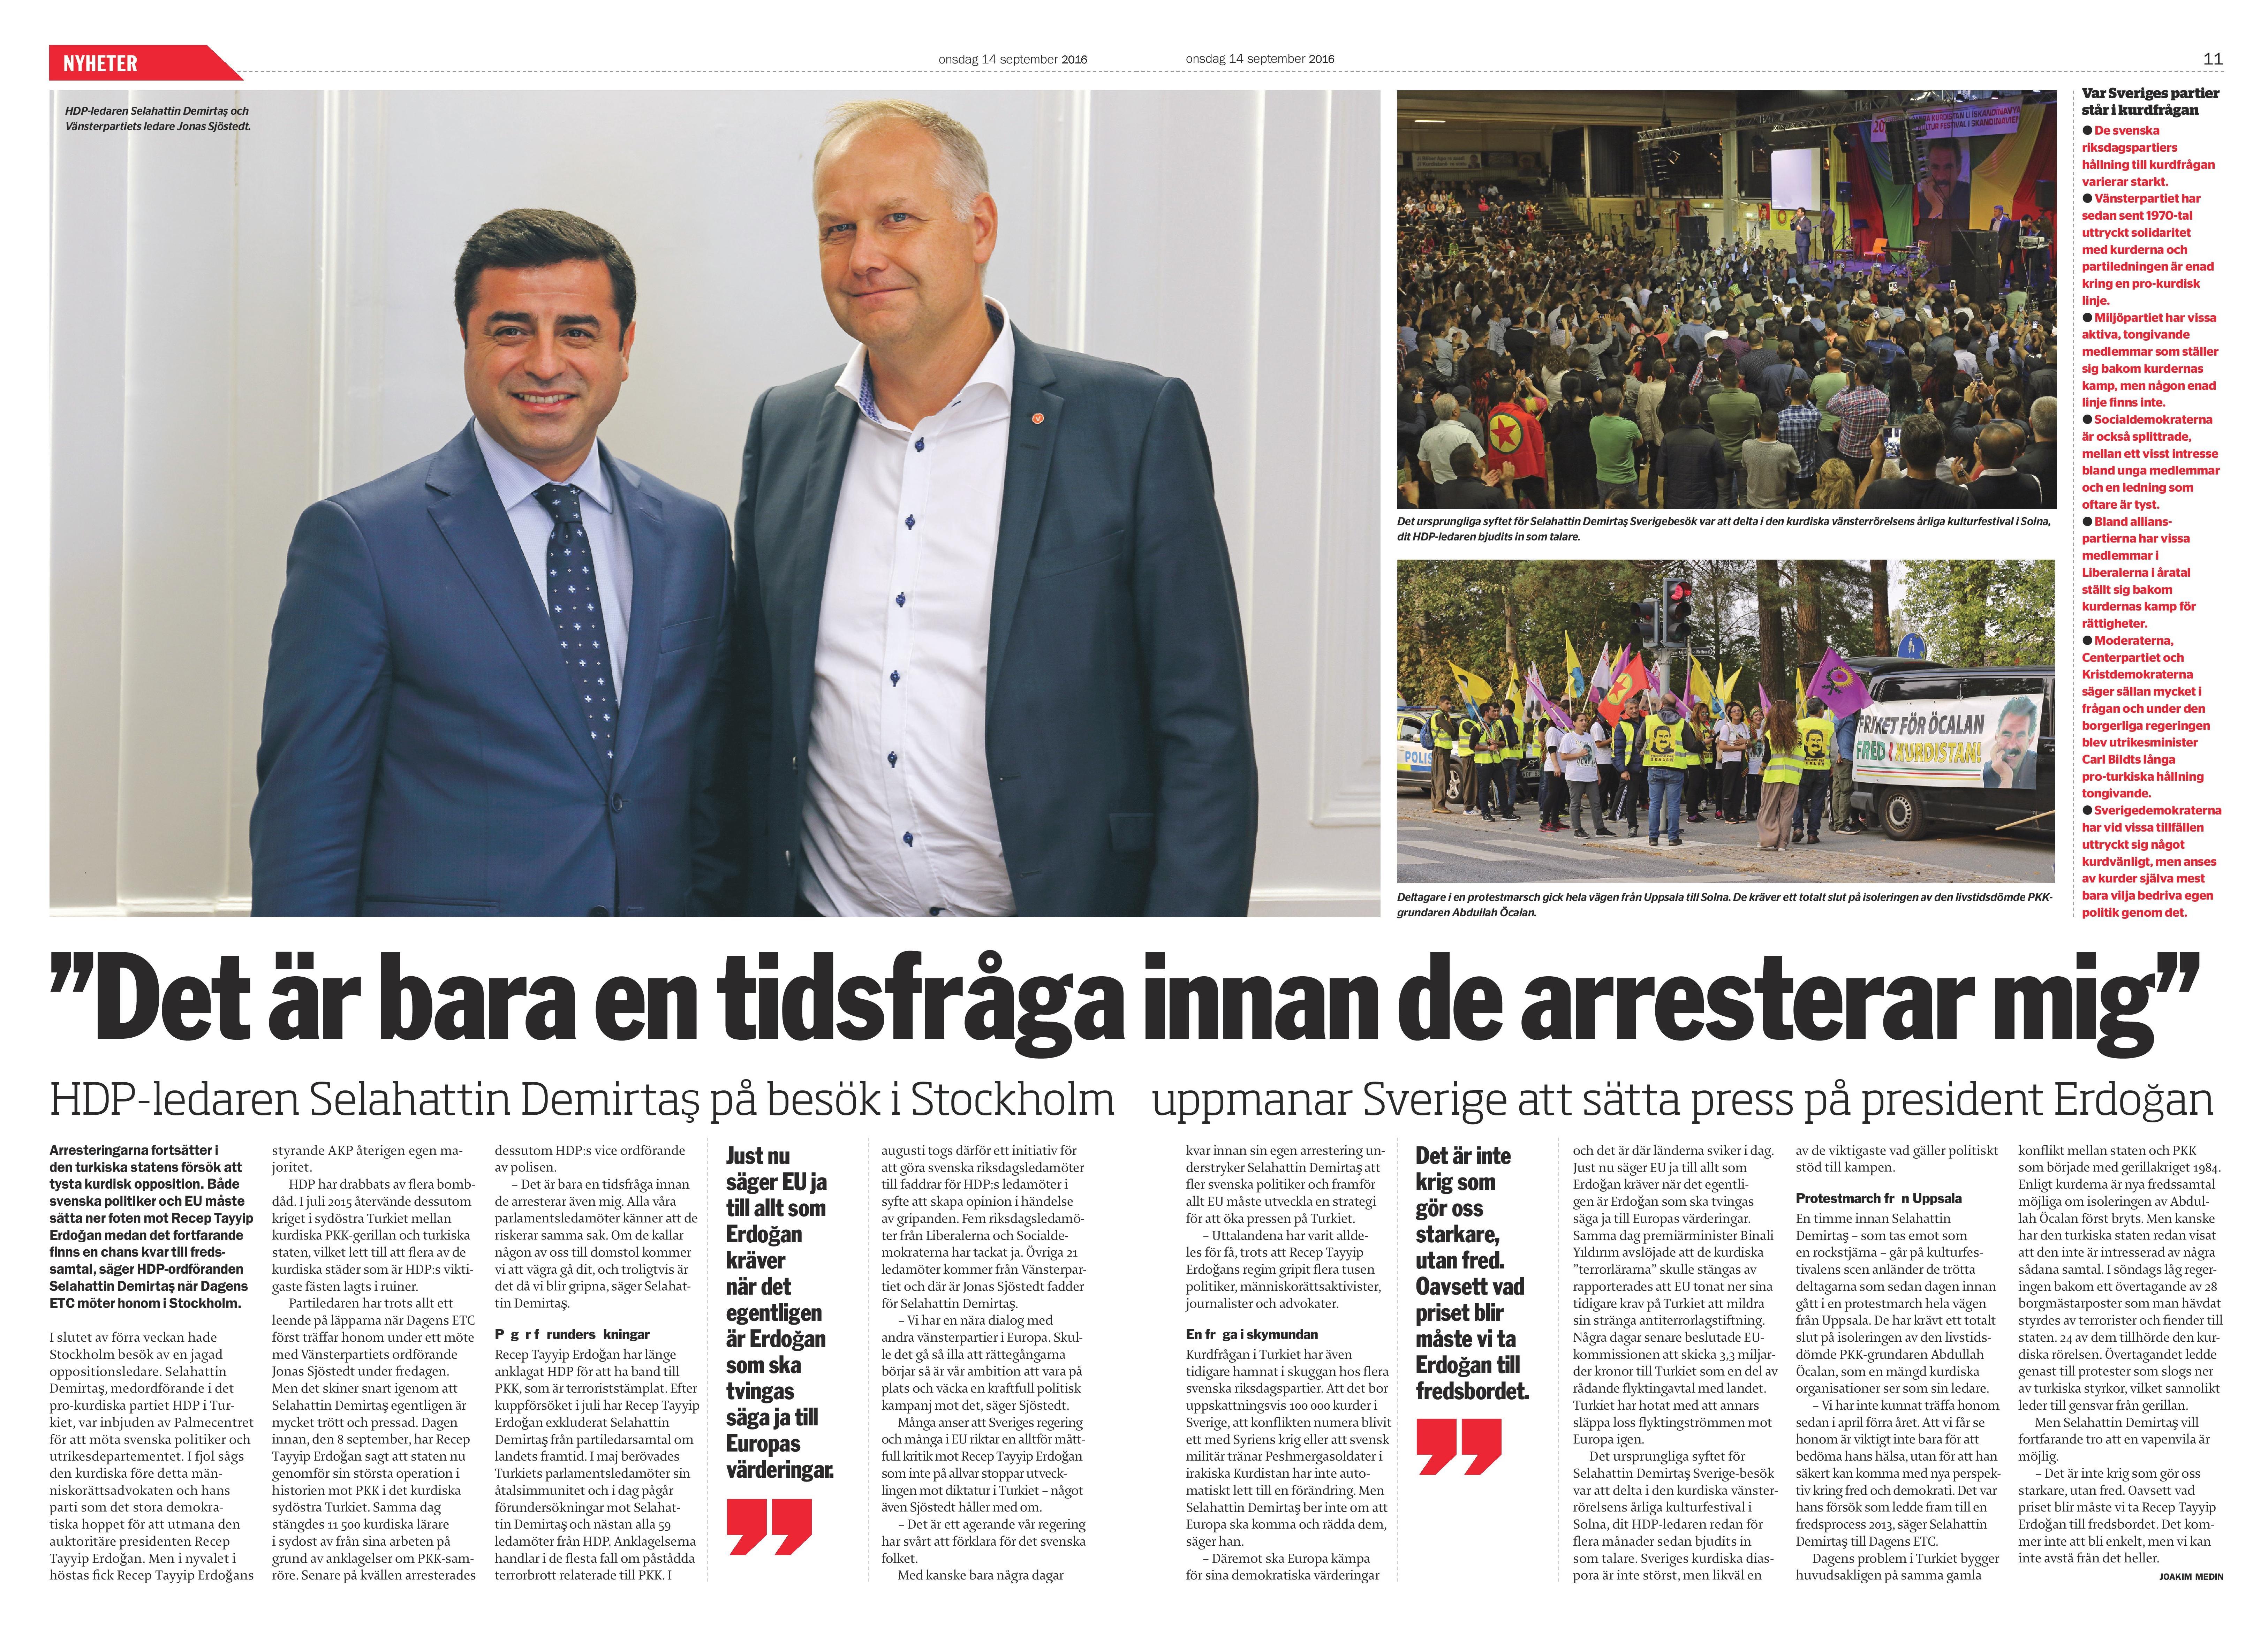 Turkiet, Dagens ETC 2016-09-14